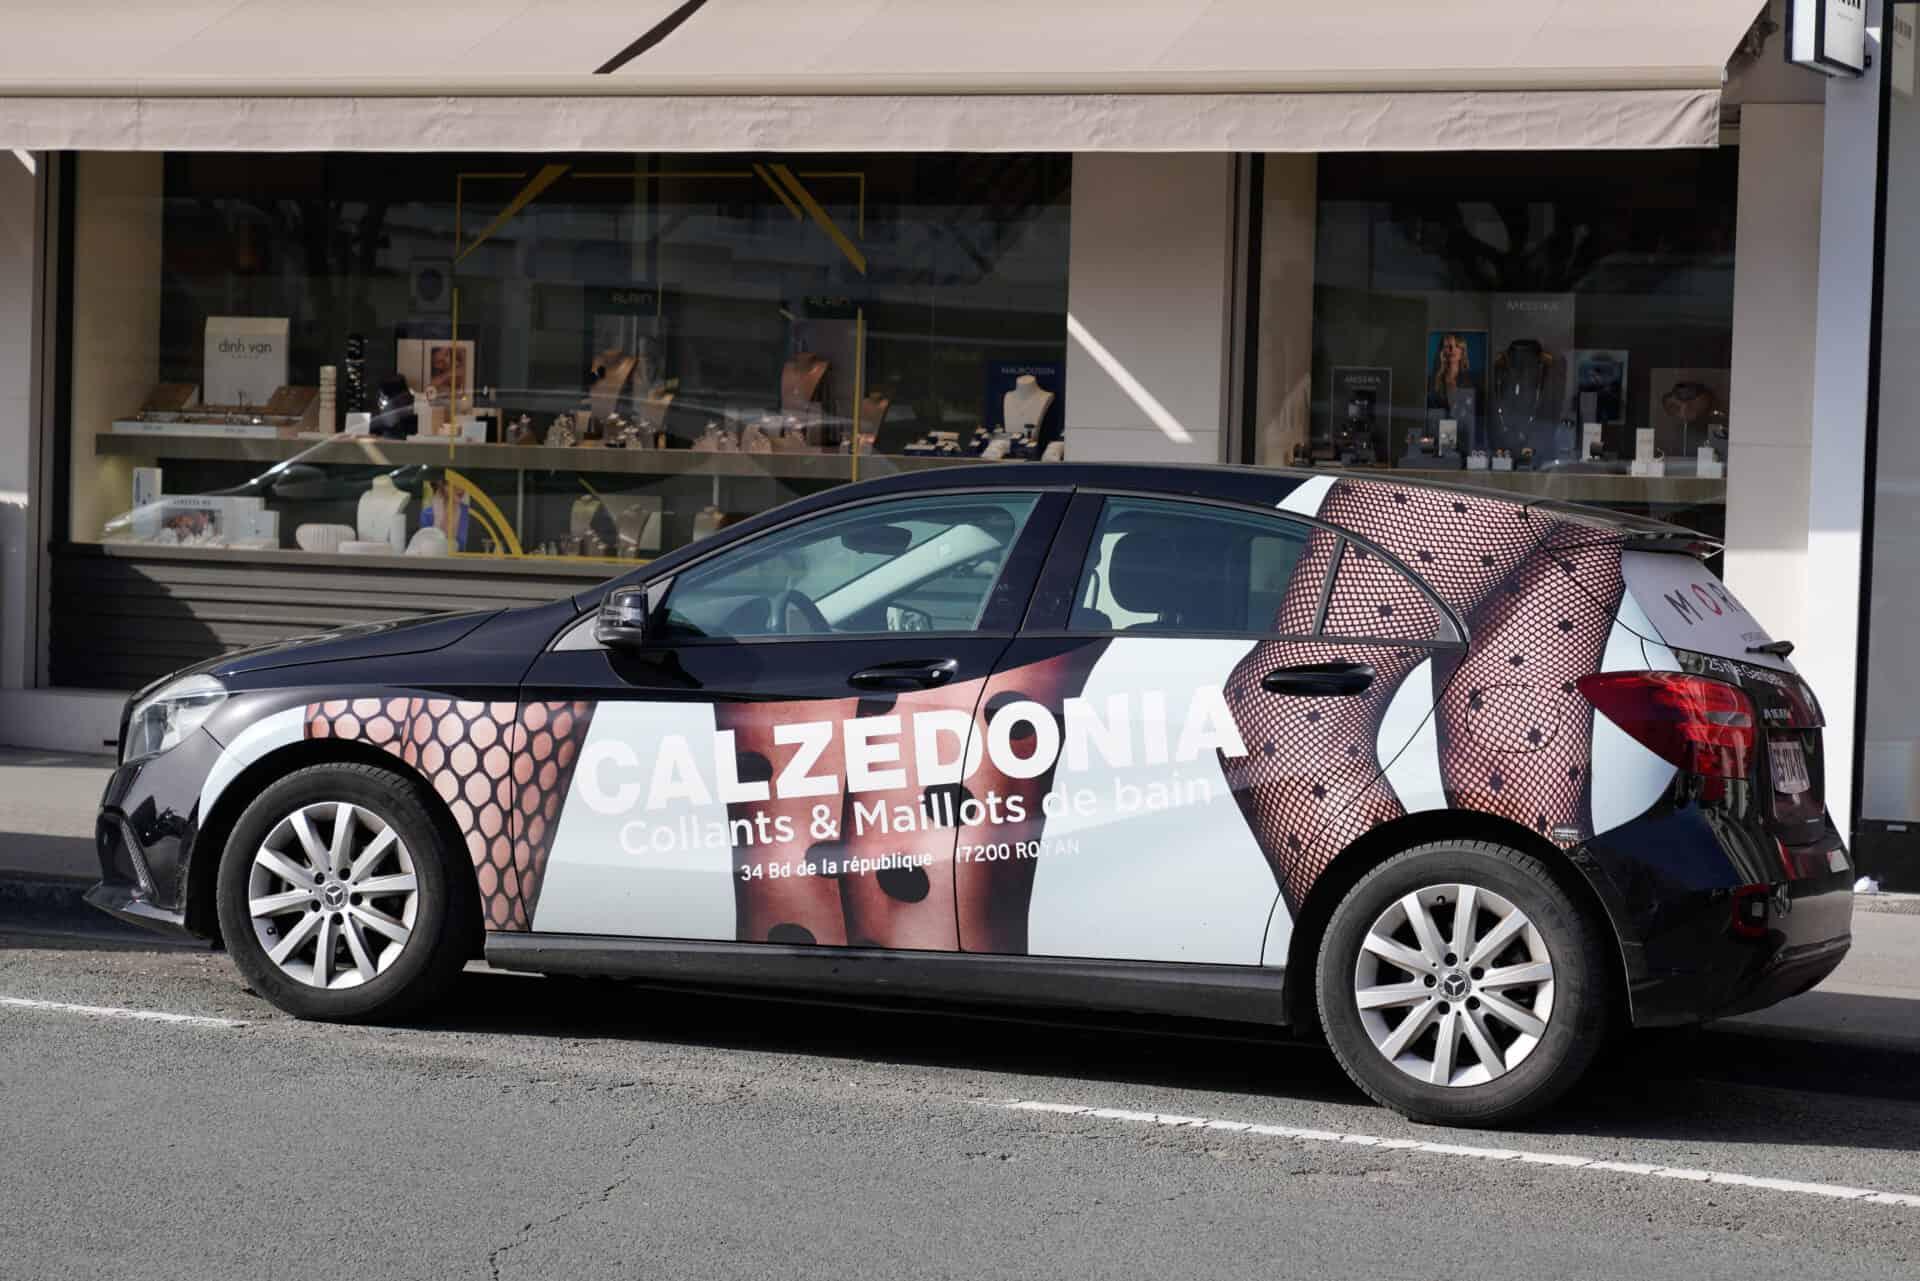 autowerbung geld verdienen